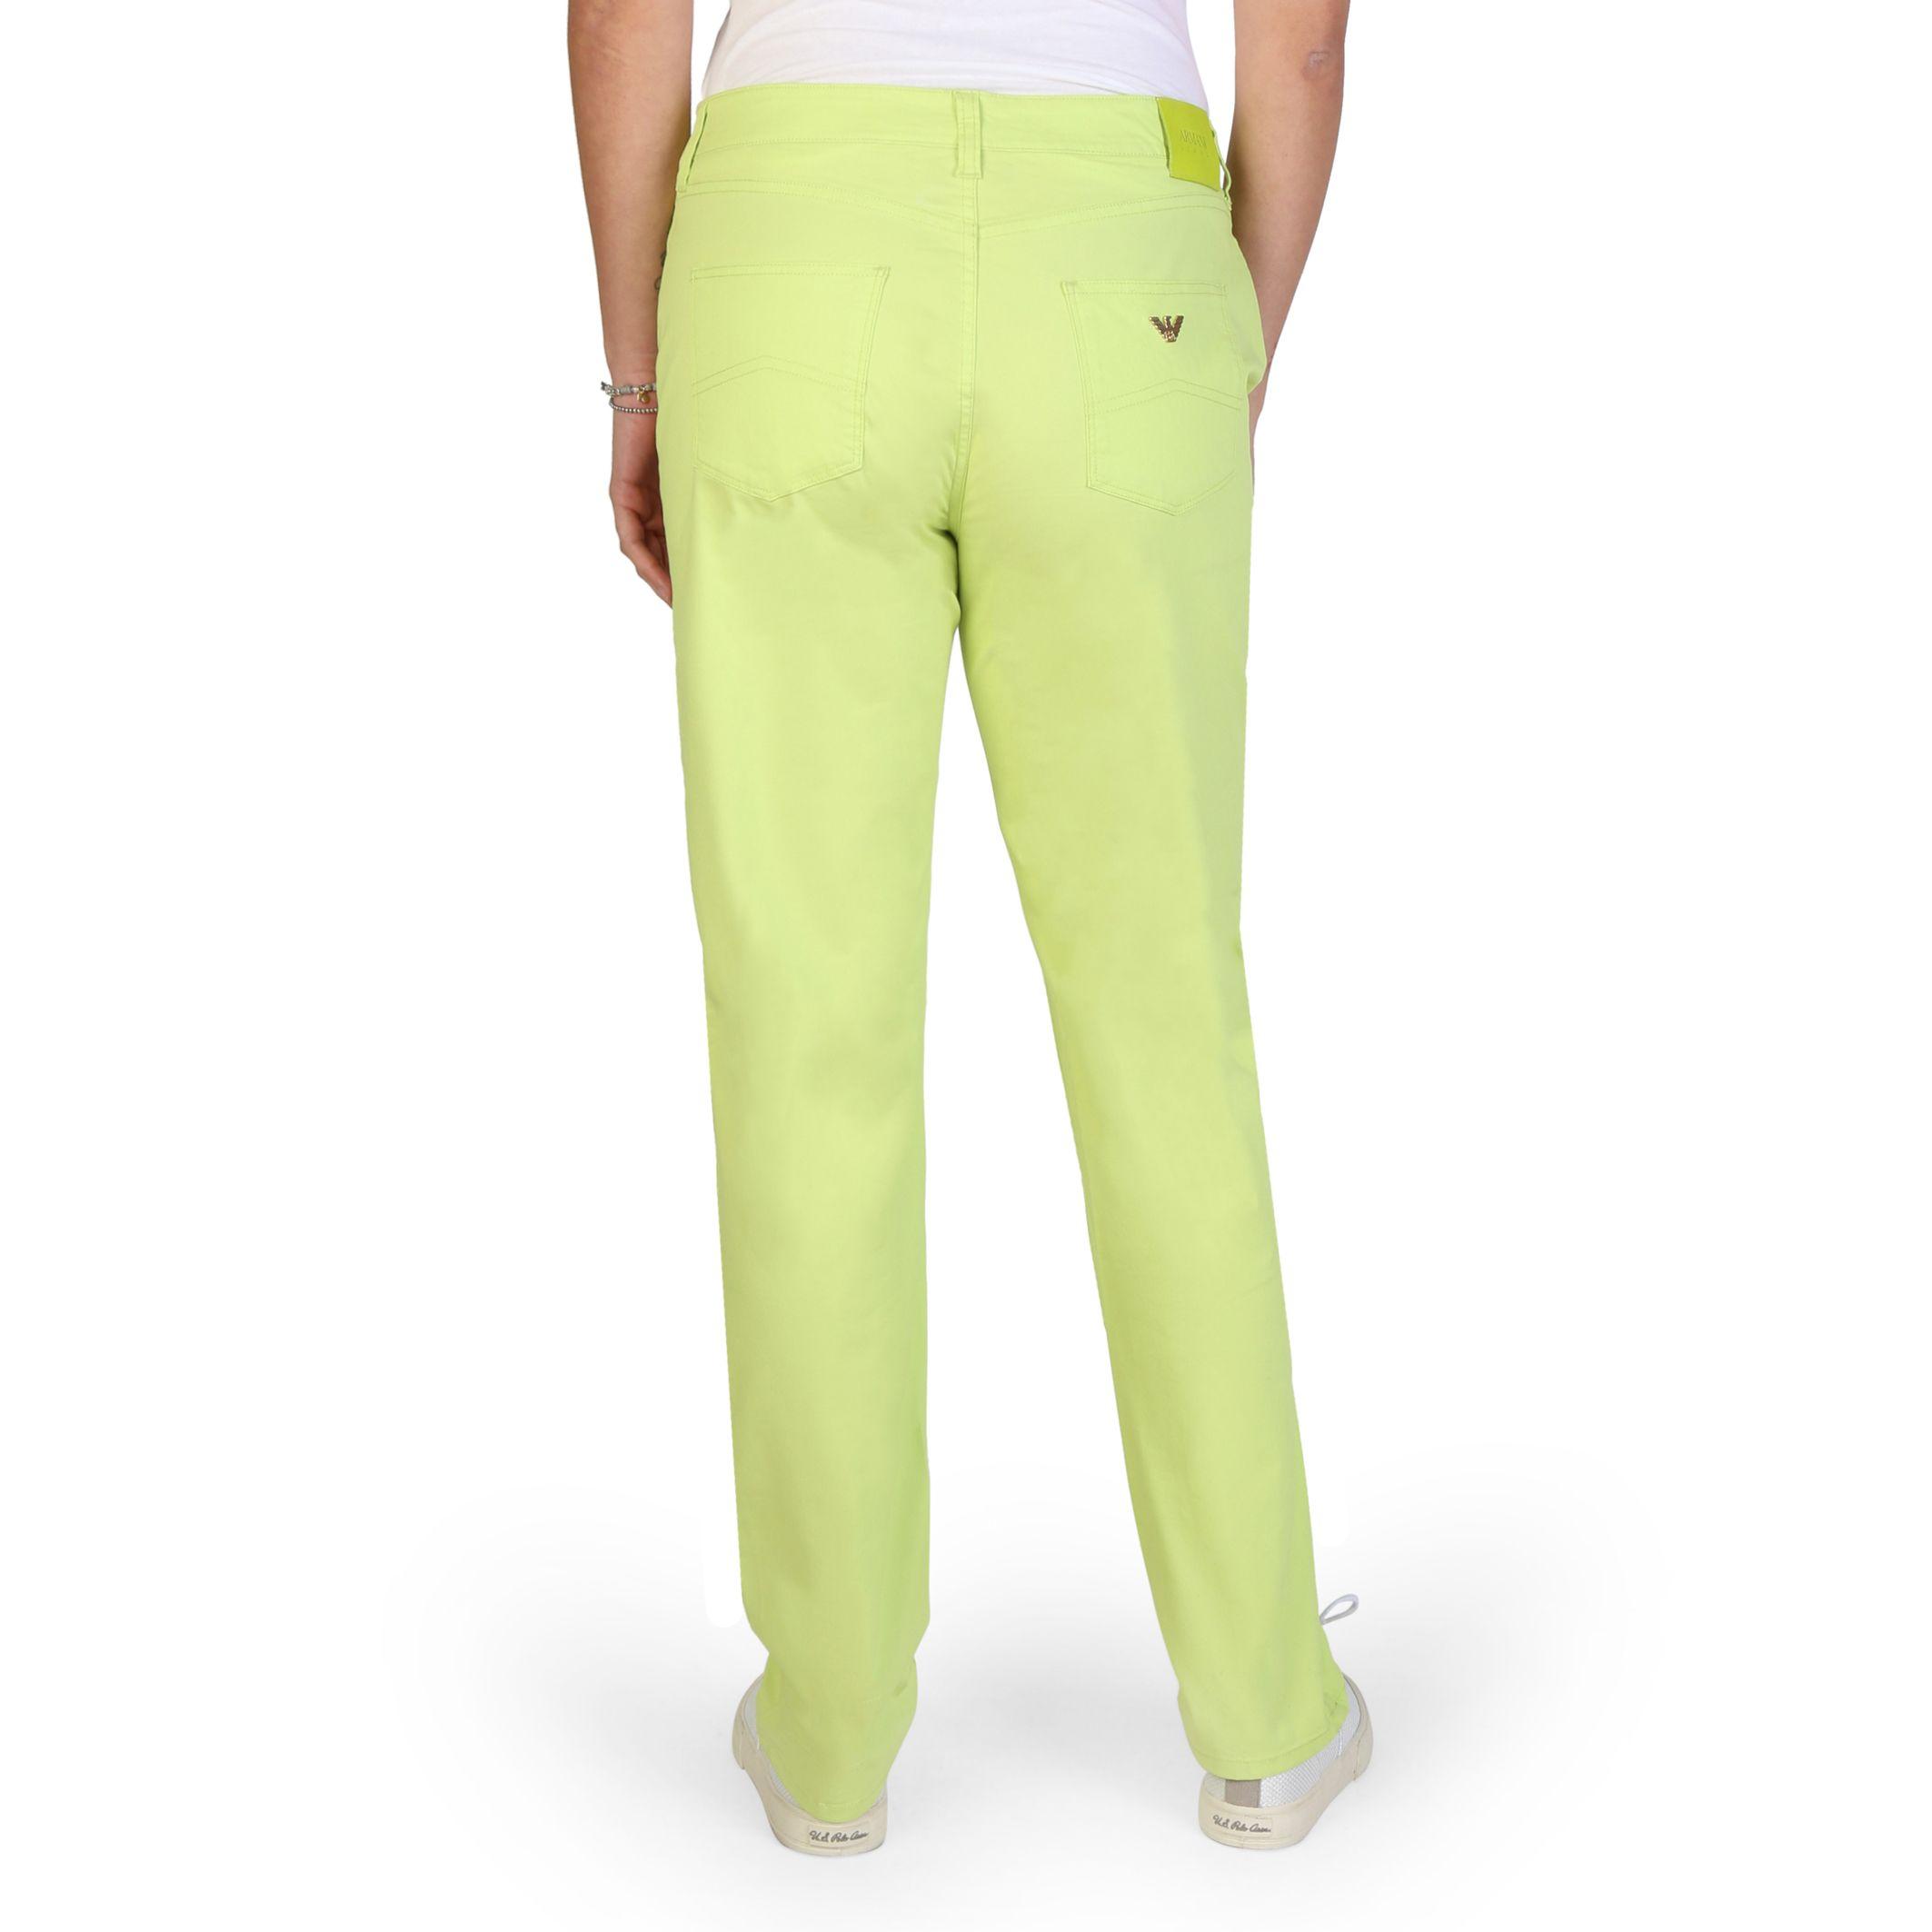 278A6680 Aa62 11Ea Aaa4 4Fcd1Fe36E6D Armani Jeans - 3Y5J18_5Nzxz - Green